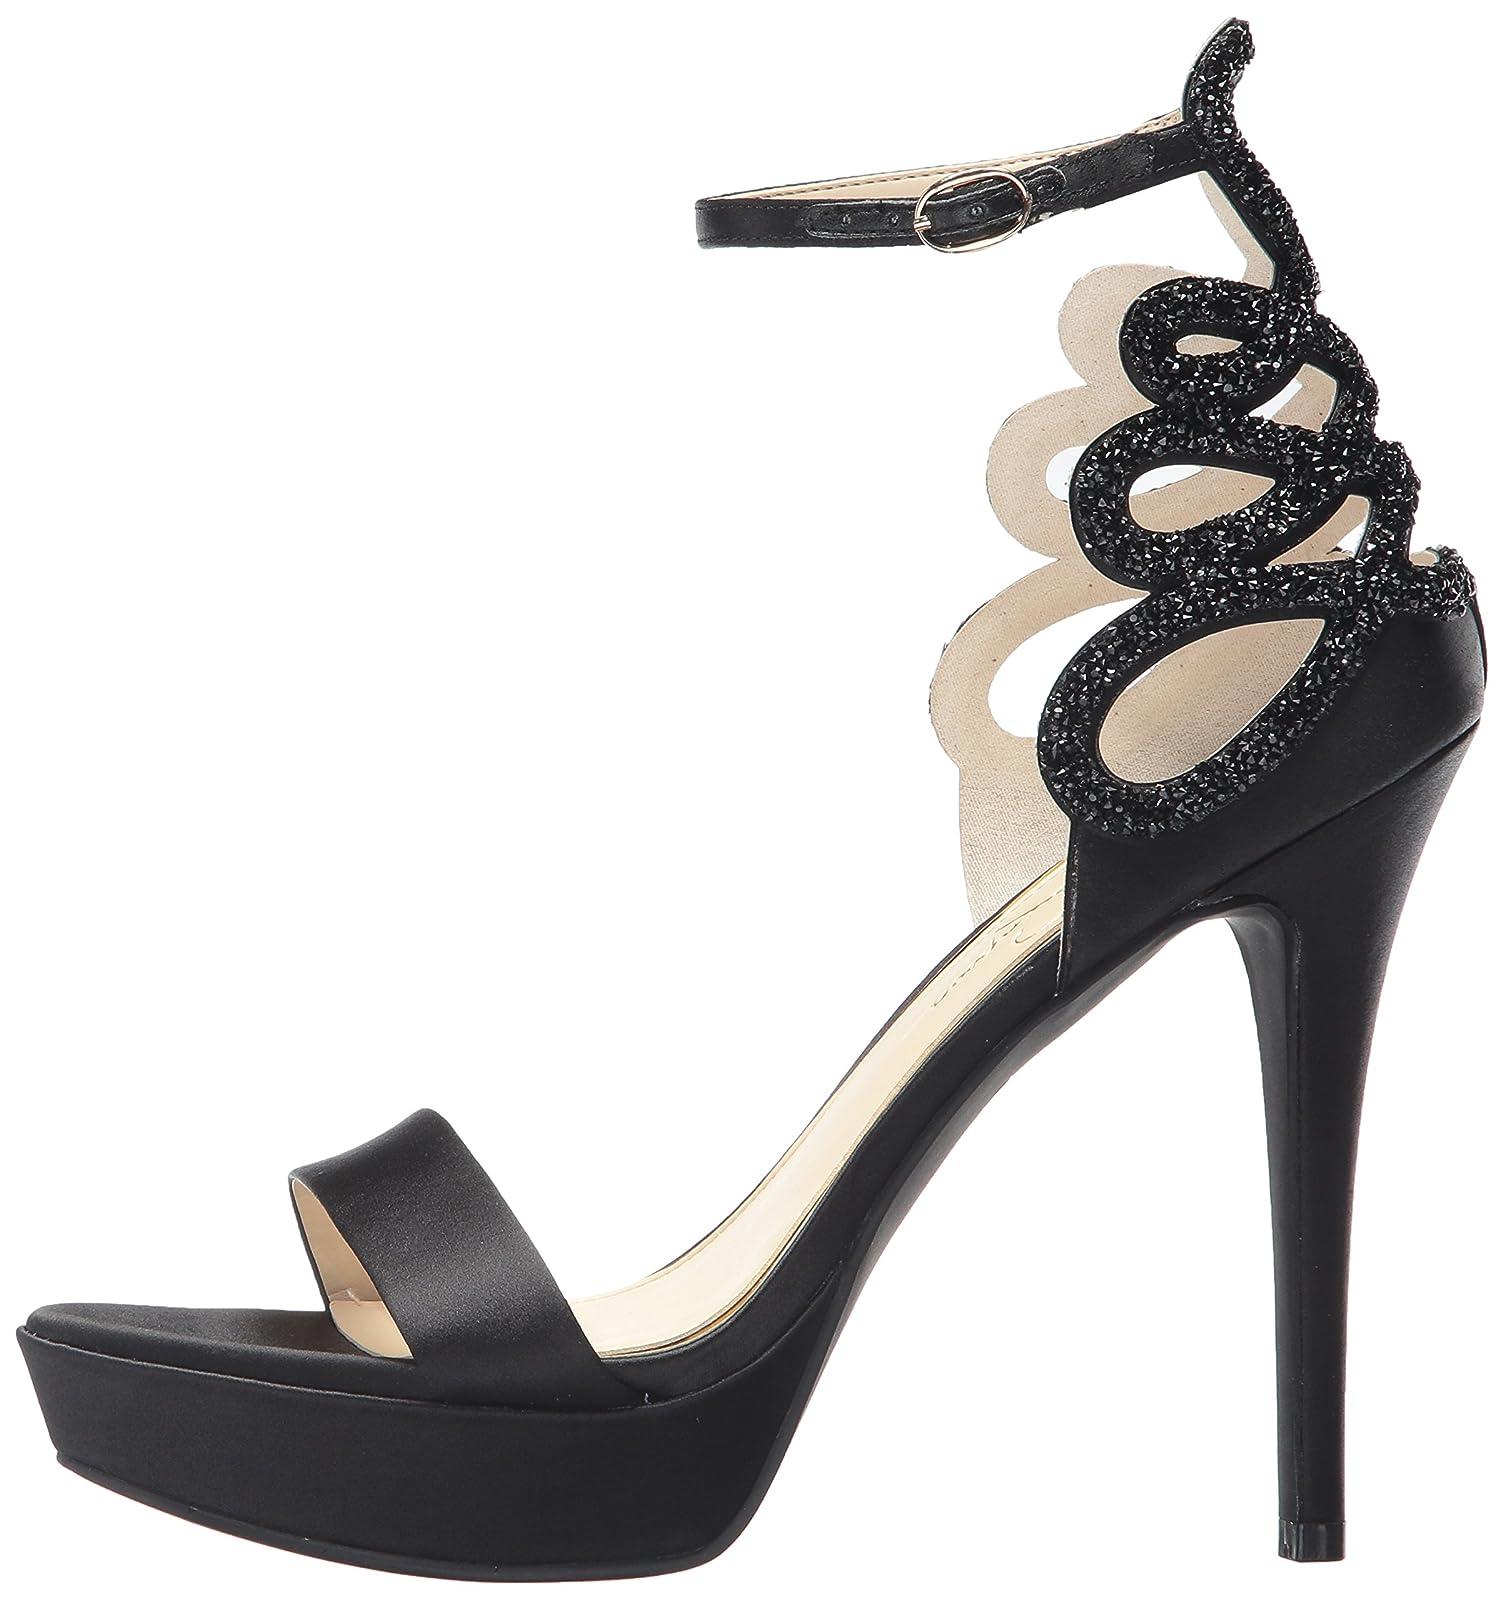 Jessica Simpson Women's BAYVINN Heeled Sandal US - 5